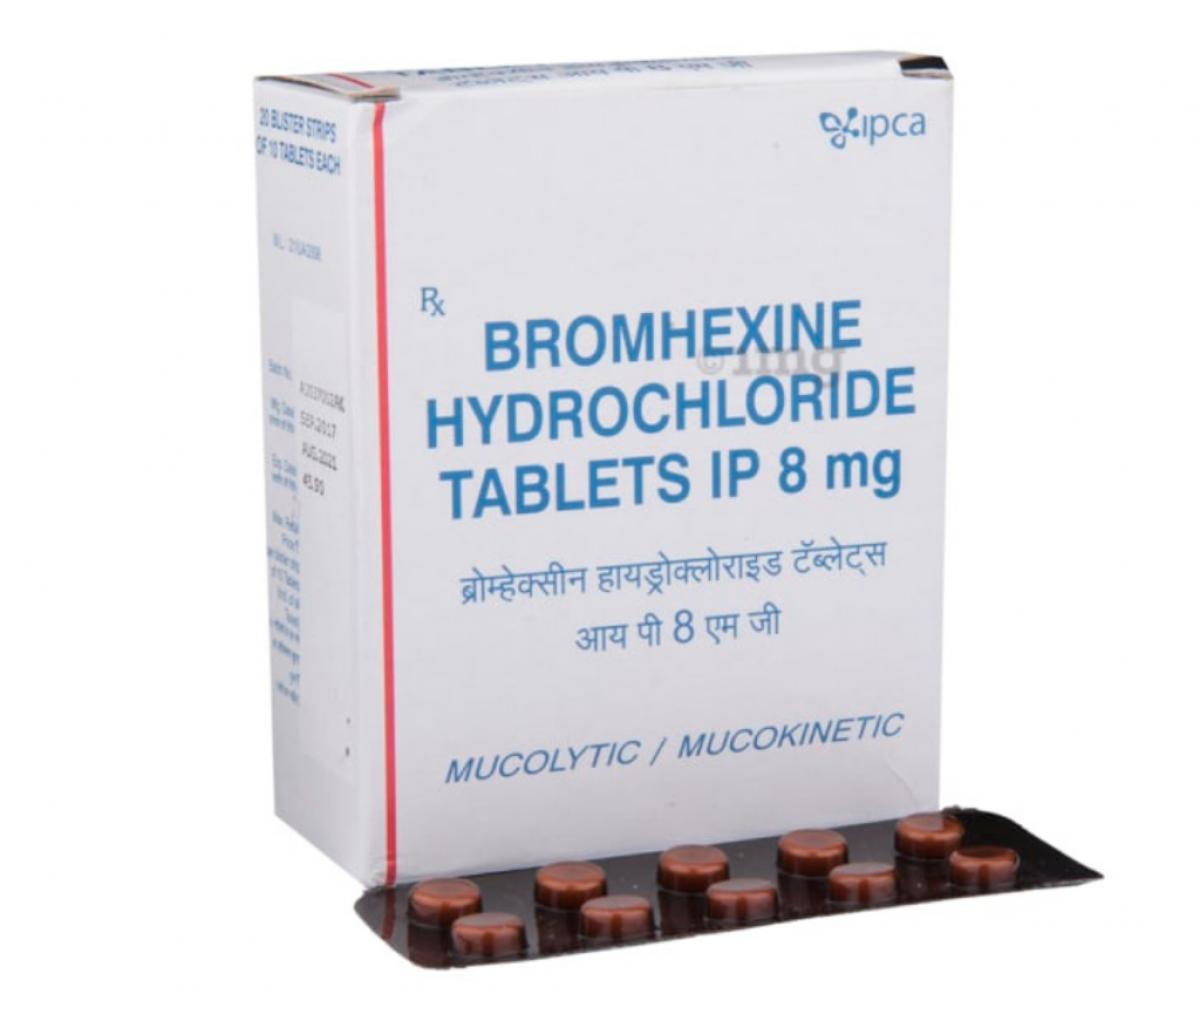 Bromhexine Hydrochloride 8mg Tablet